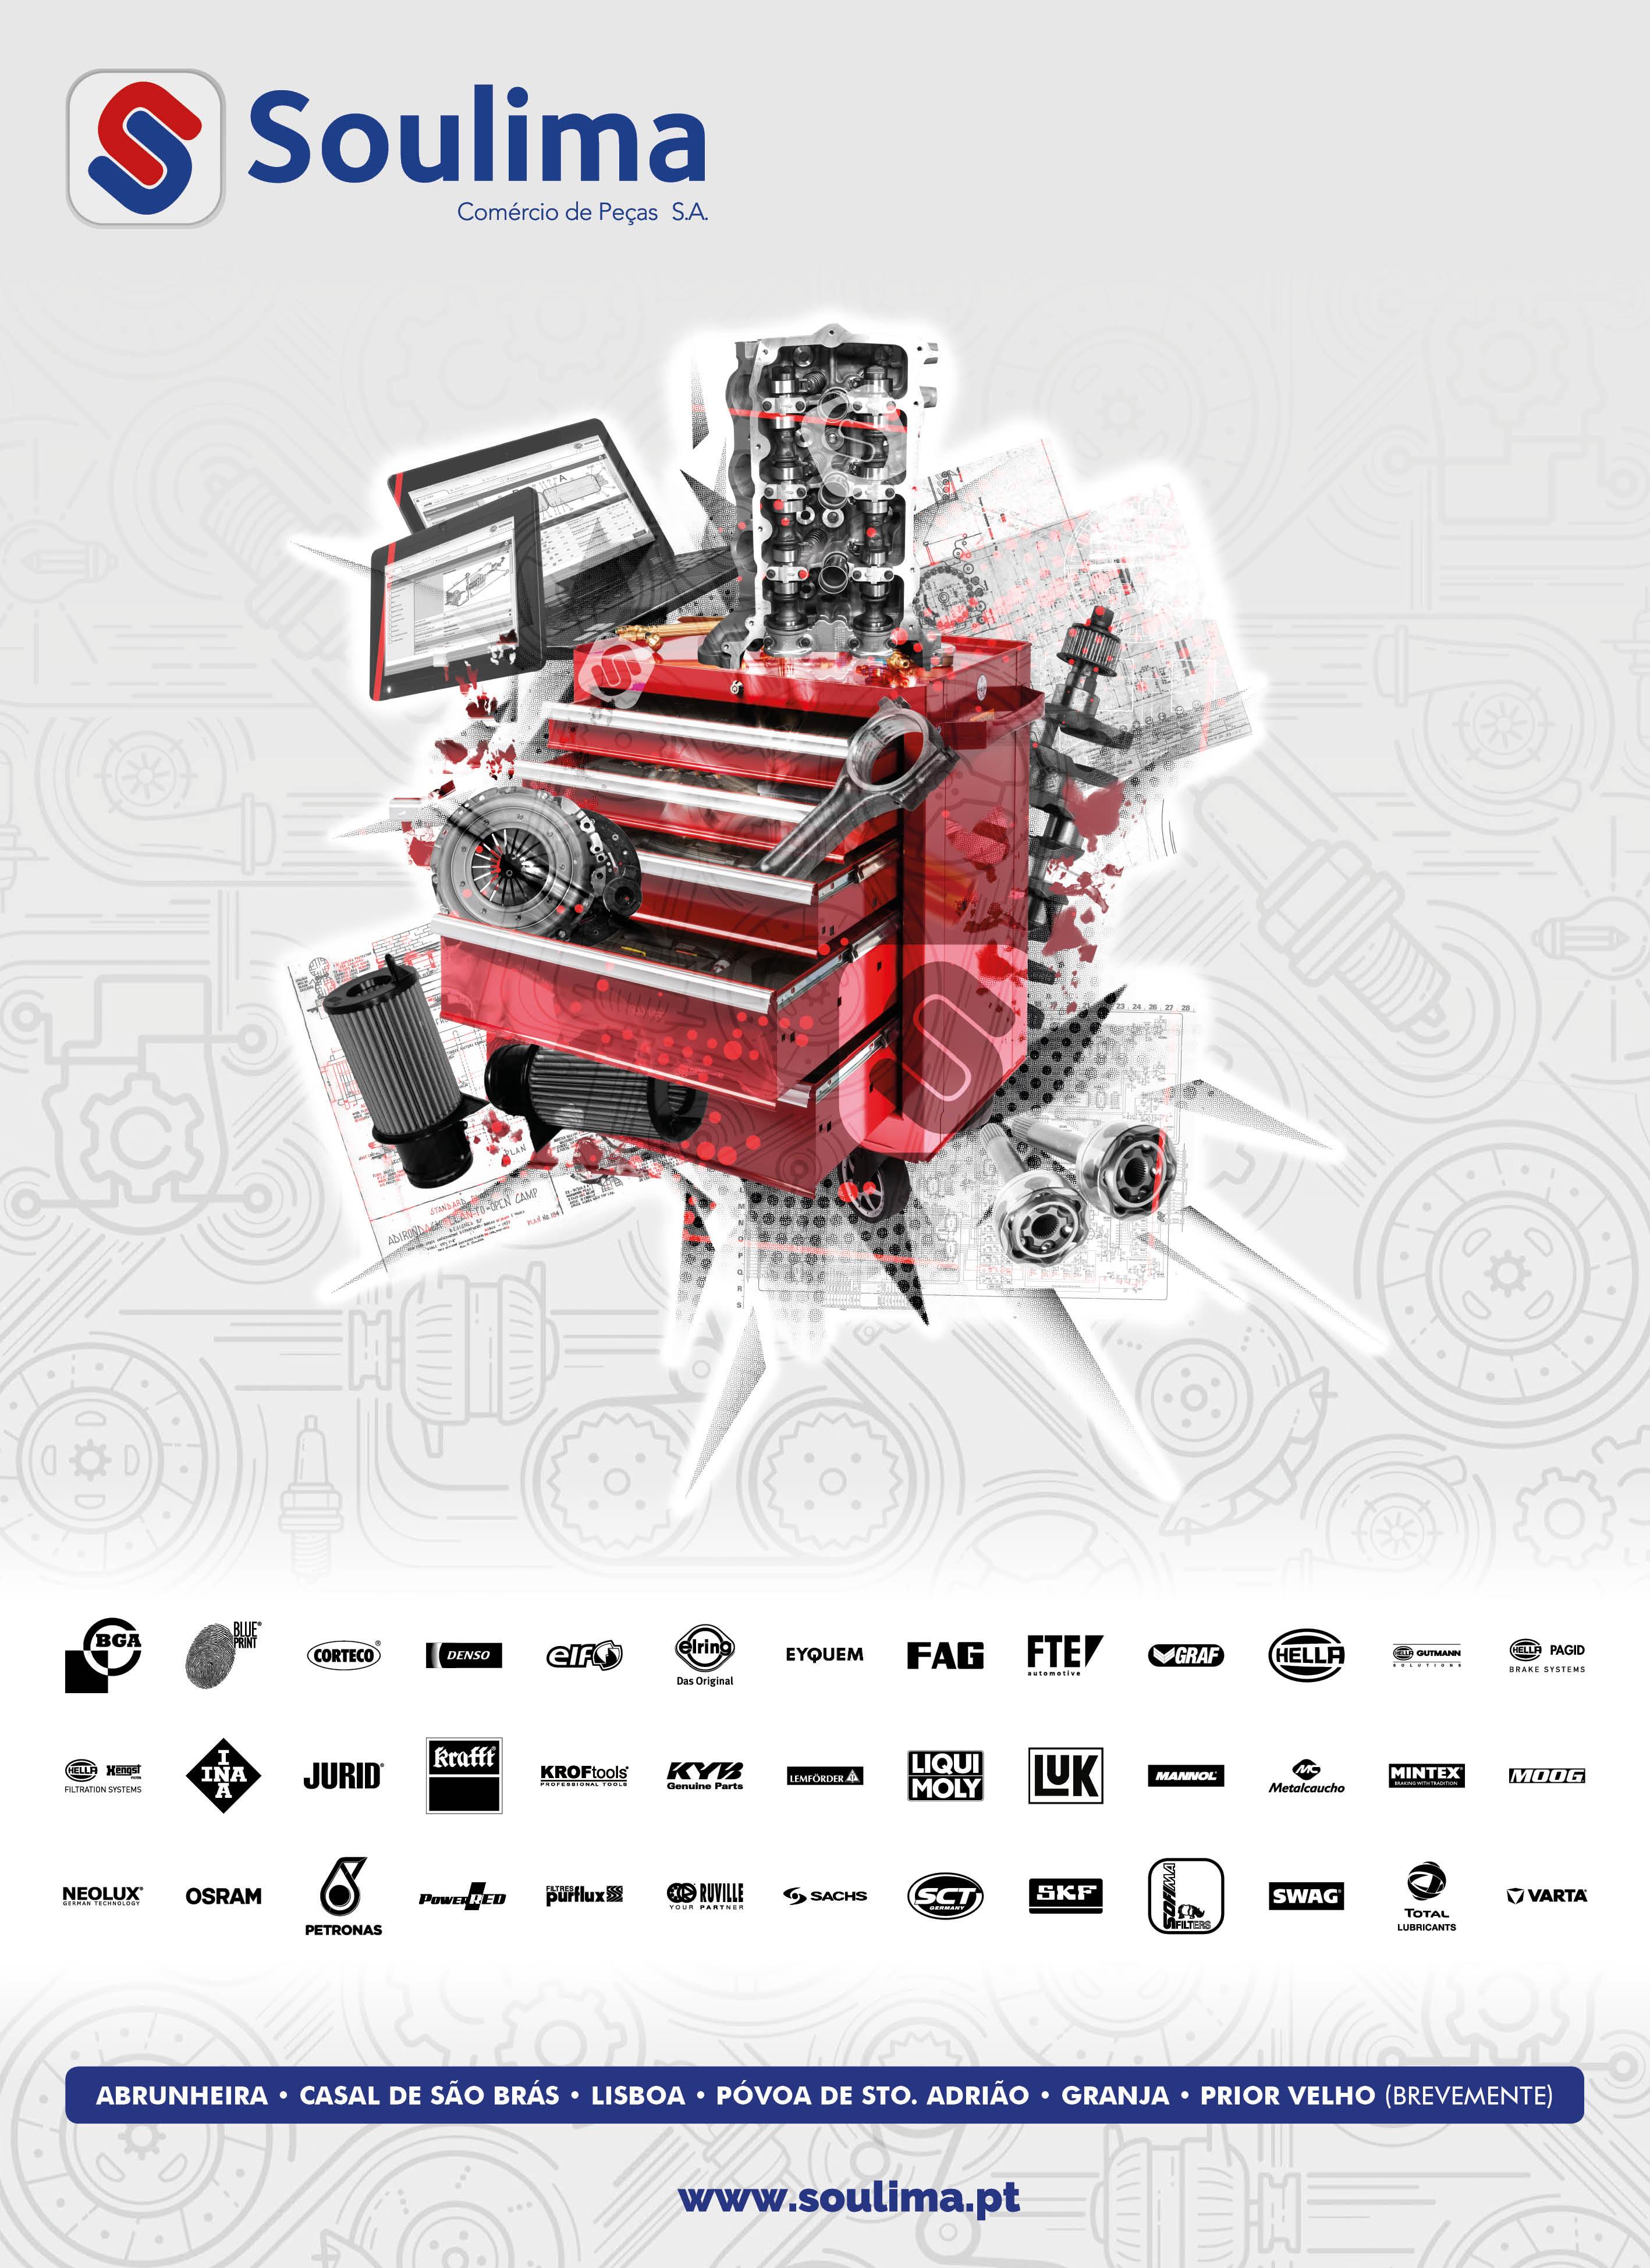 Soulima - Comércio de Peças - Brochure Design Soulima - Cover | Way2Start - Design & Digital Agency